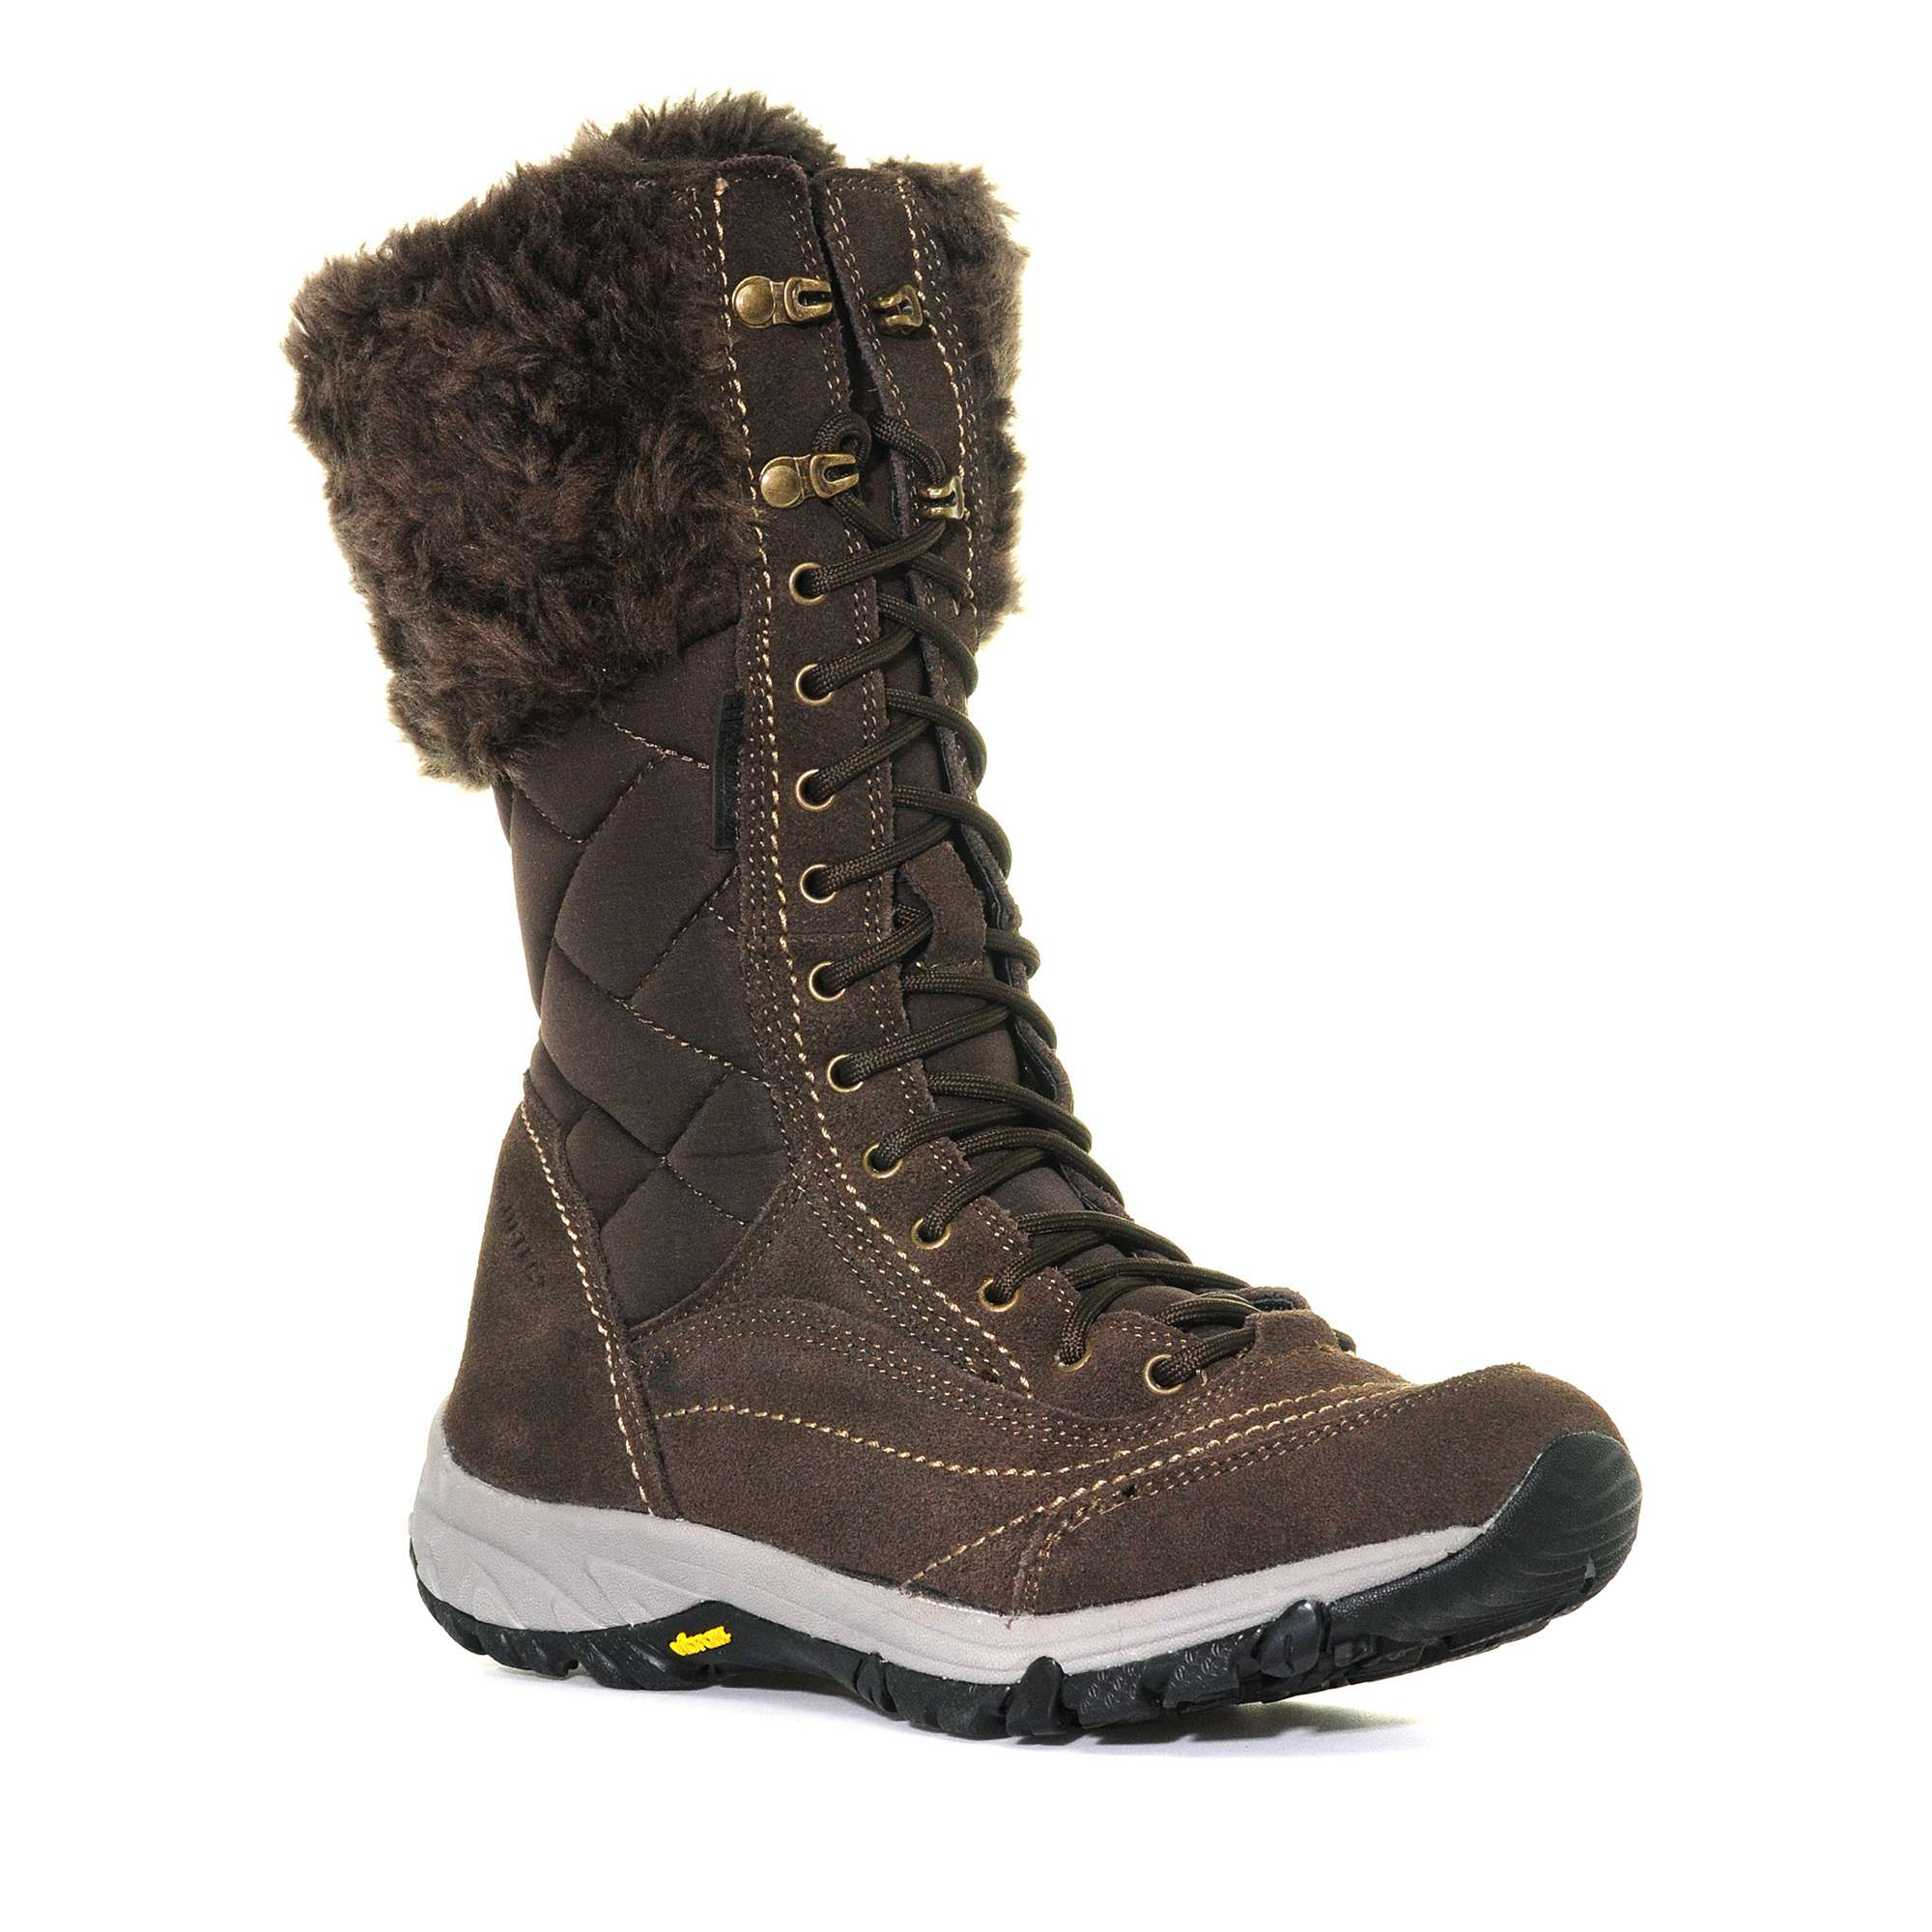 HI TEC Women's Harmony Quilt Boots